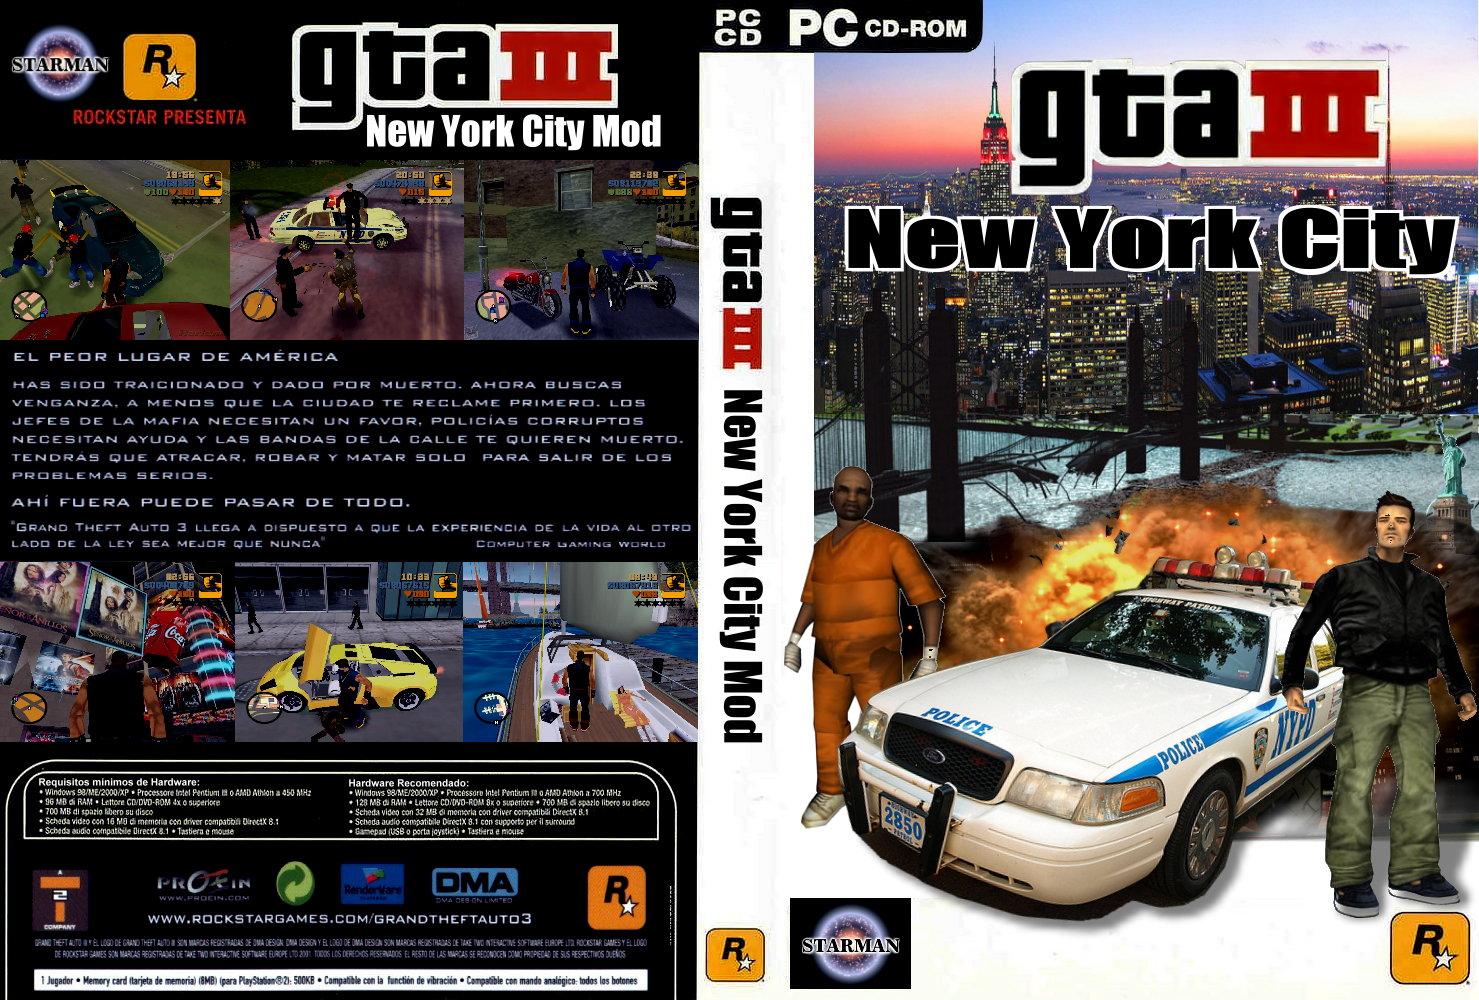 Gta 3 new york city edition 2011   Free Games